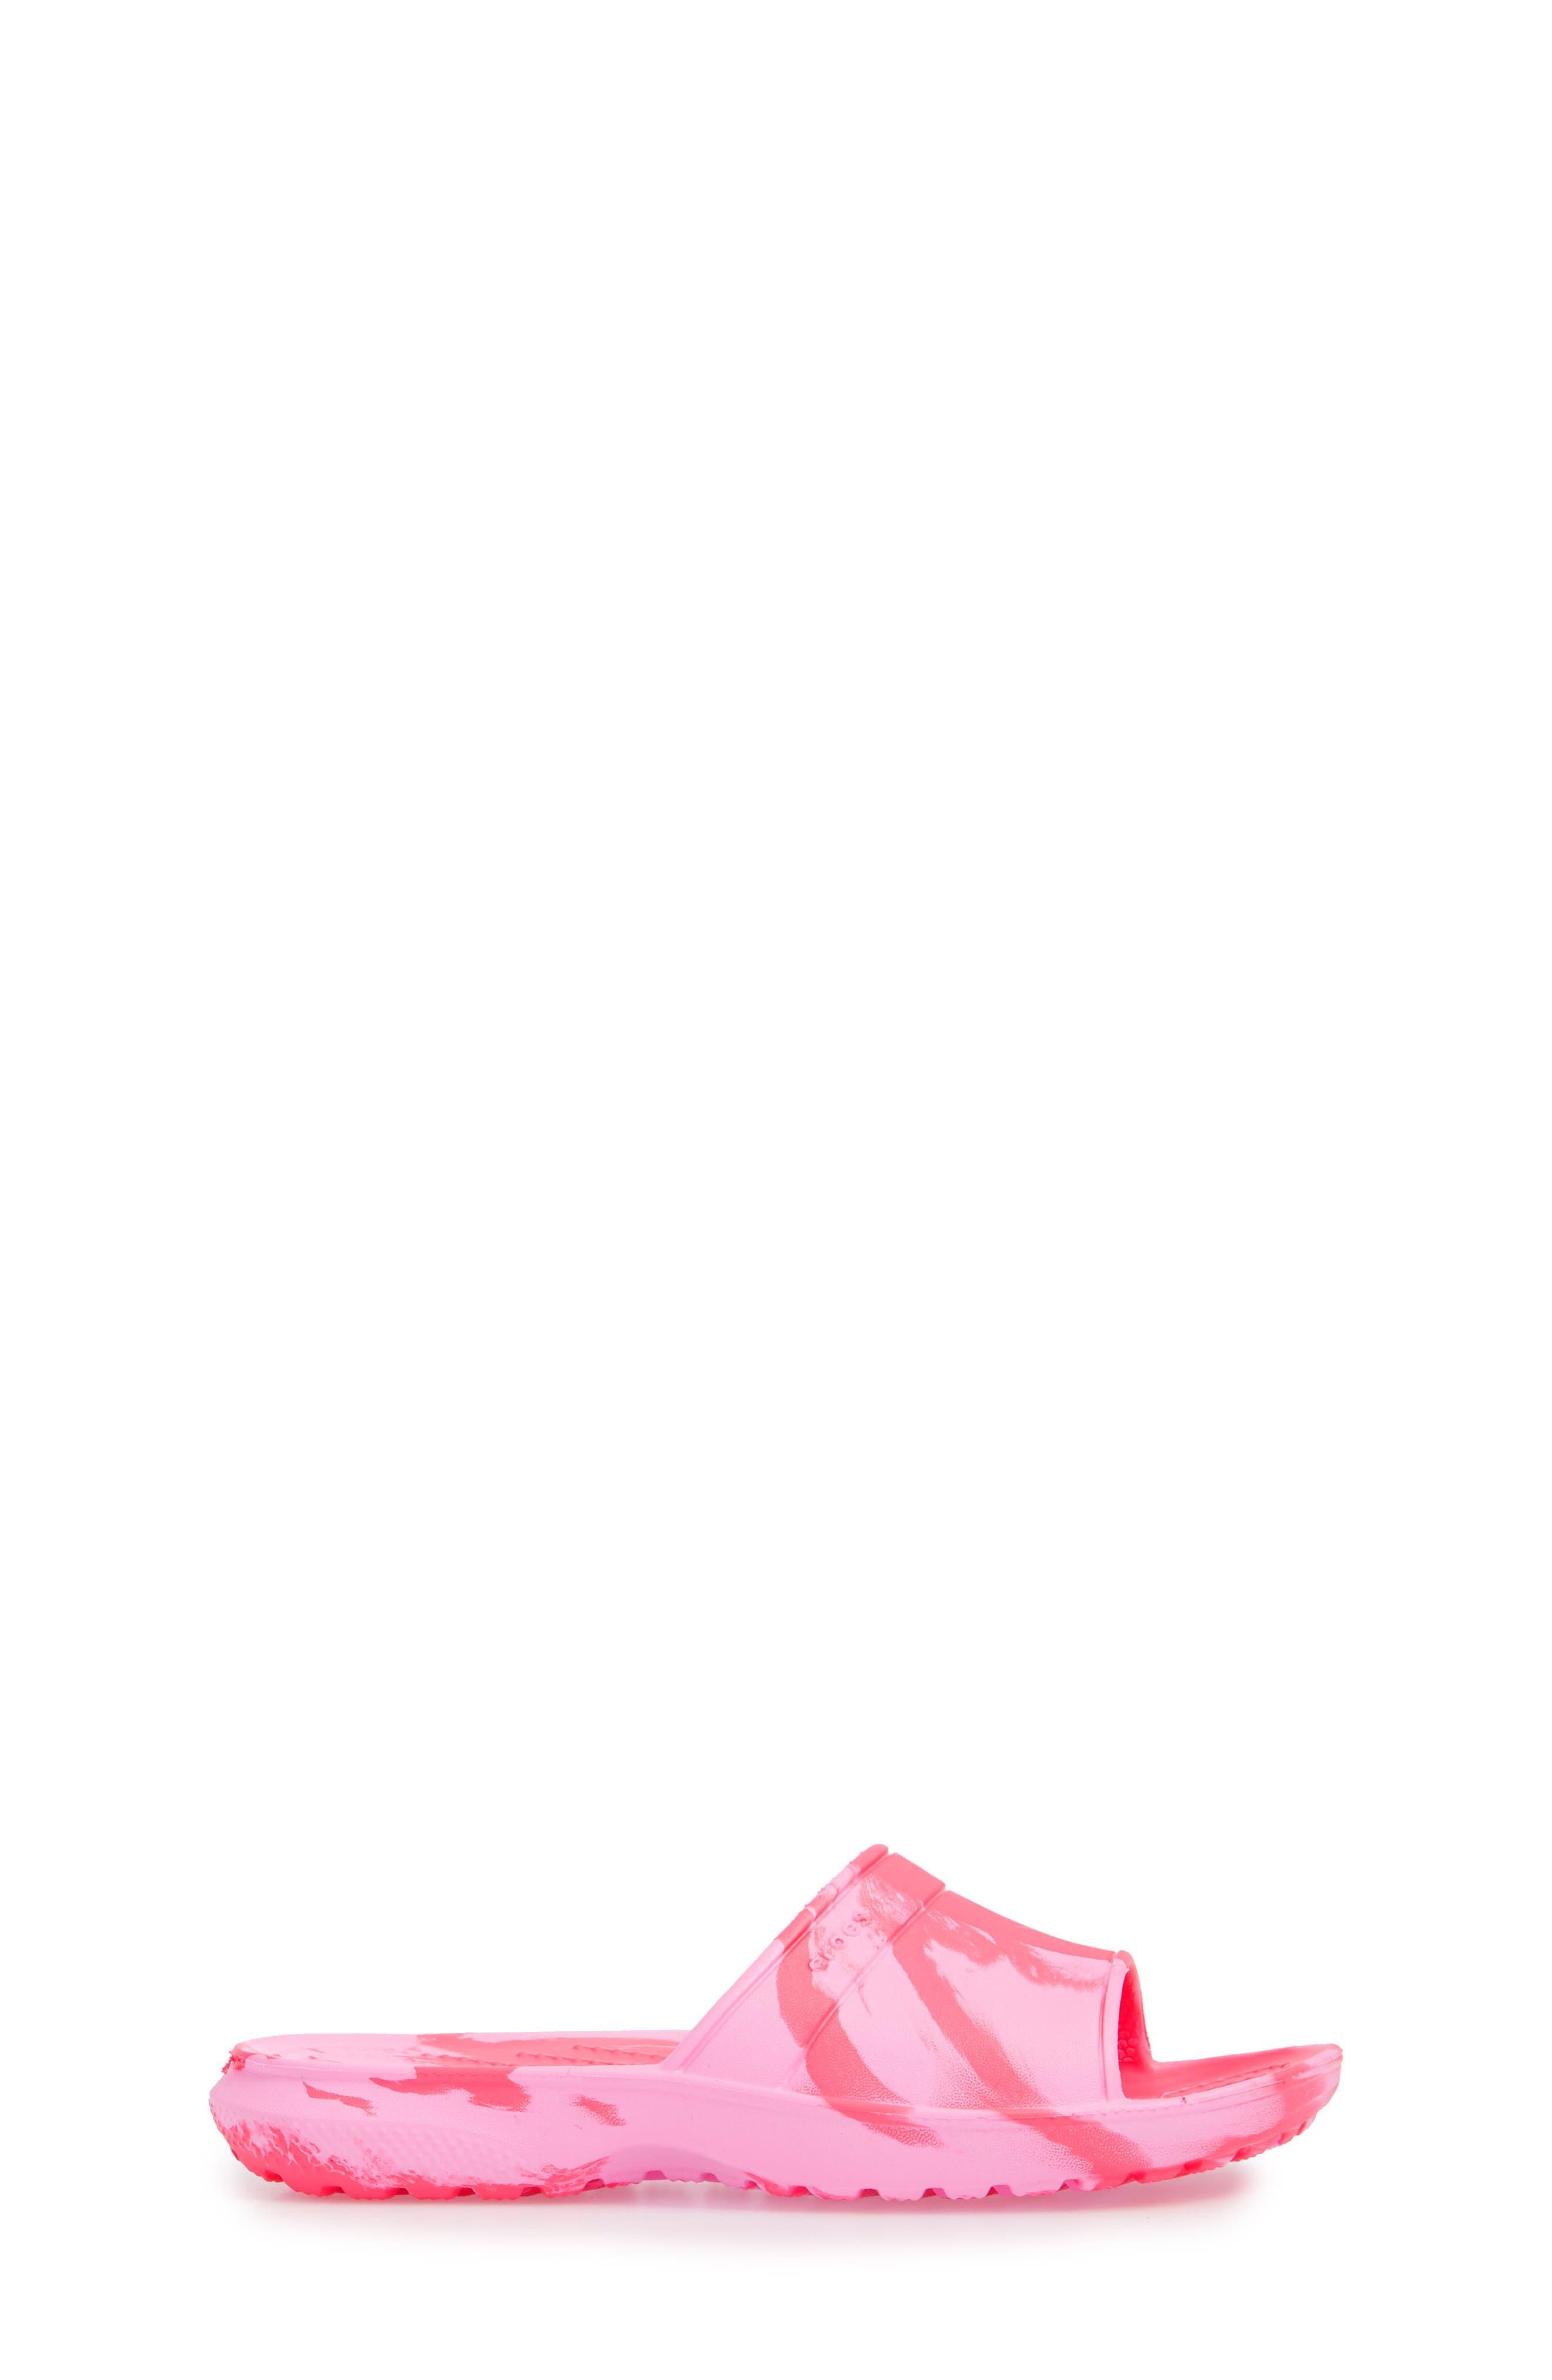 Classic Swirl Slide,                             Alternate thumbnail 3, color,                             Paradise Pink